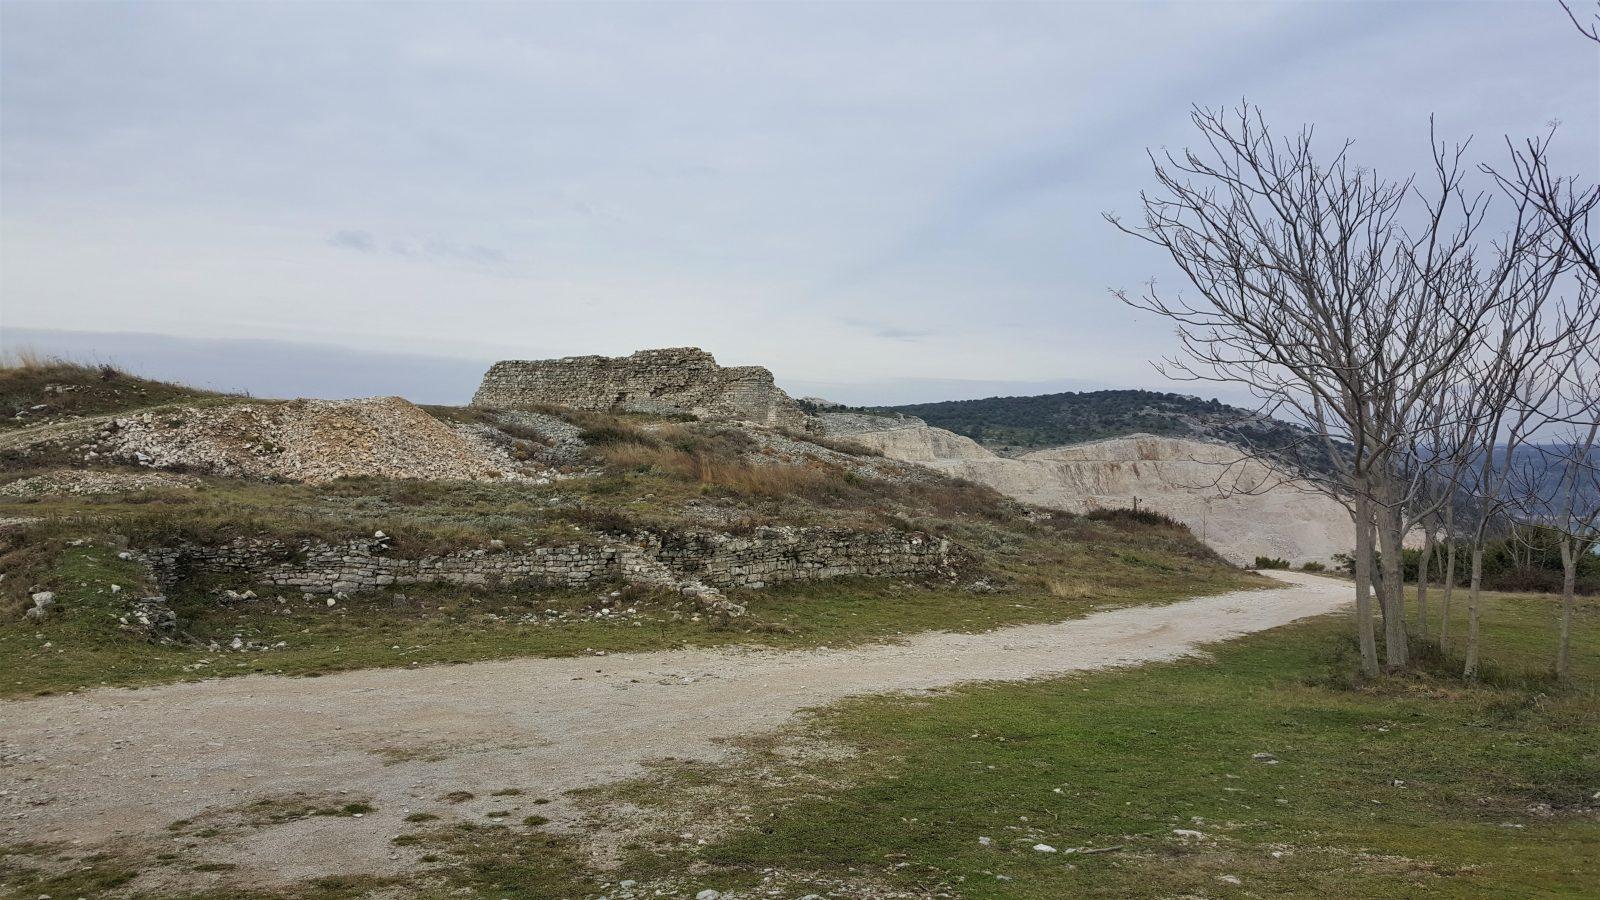 Stari Rakalj - Istriago.net